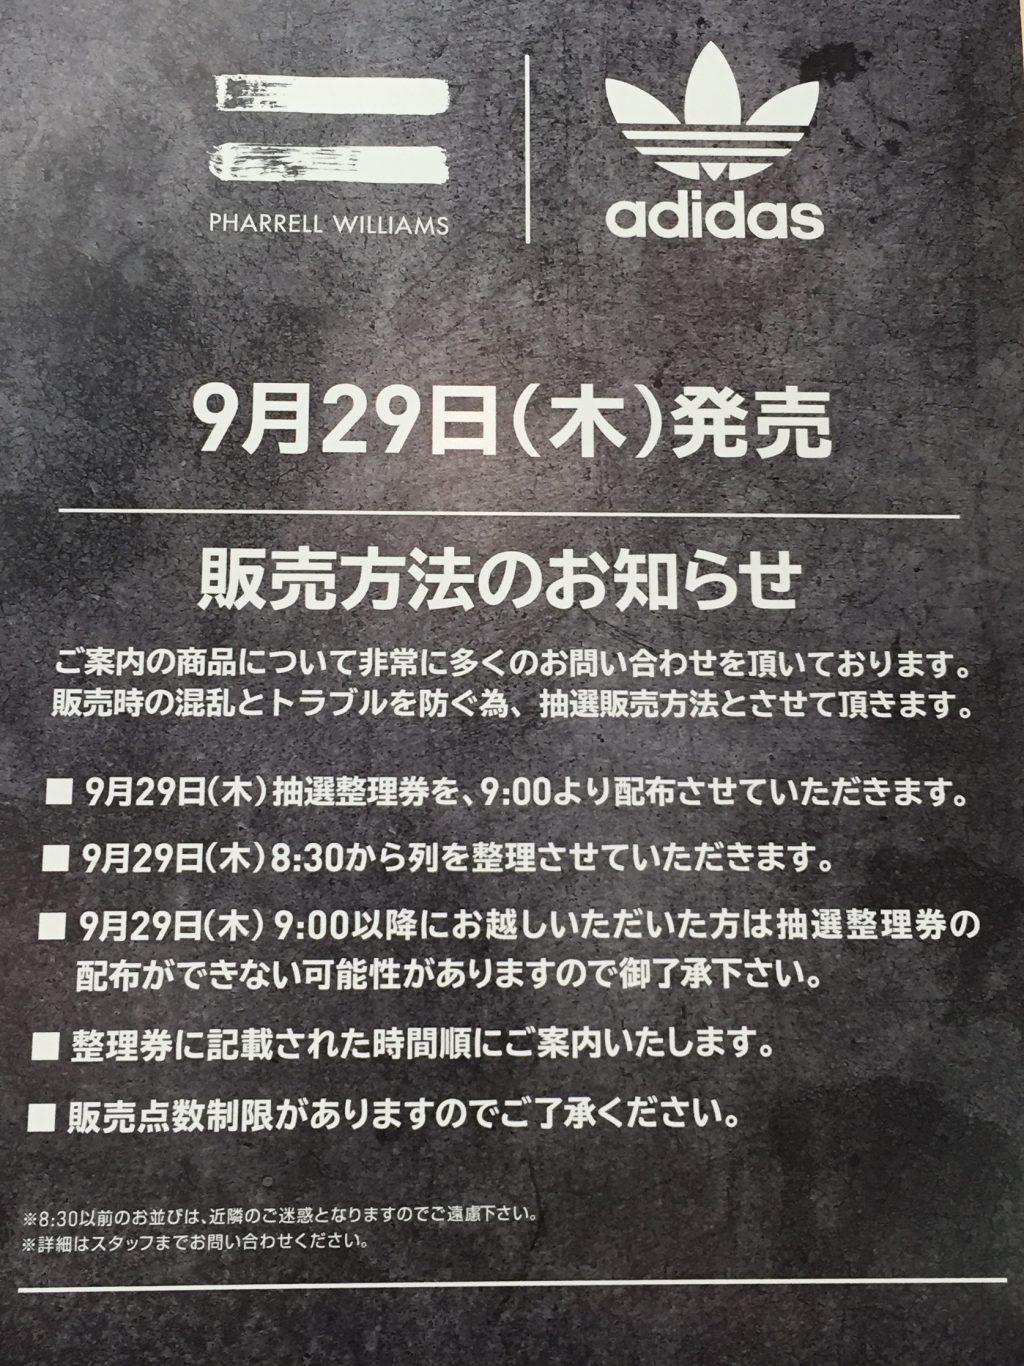 pharrell-williams-adidas-nmd-hu-new-colorway-release-20160929-shinjuku